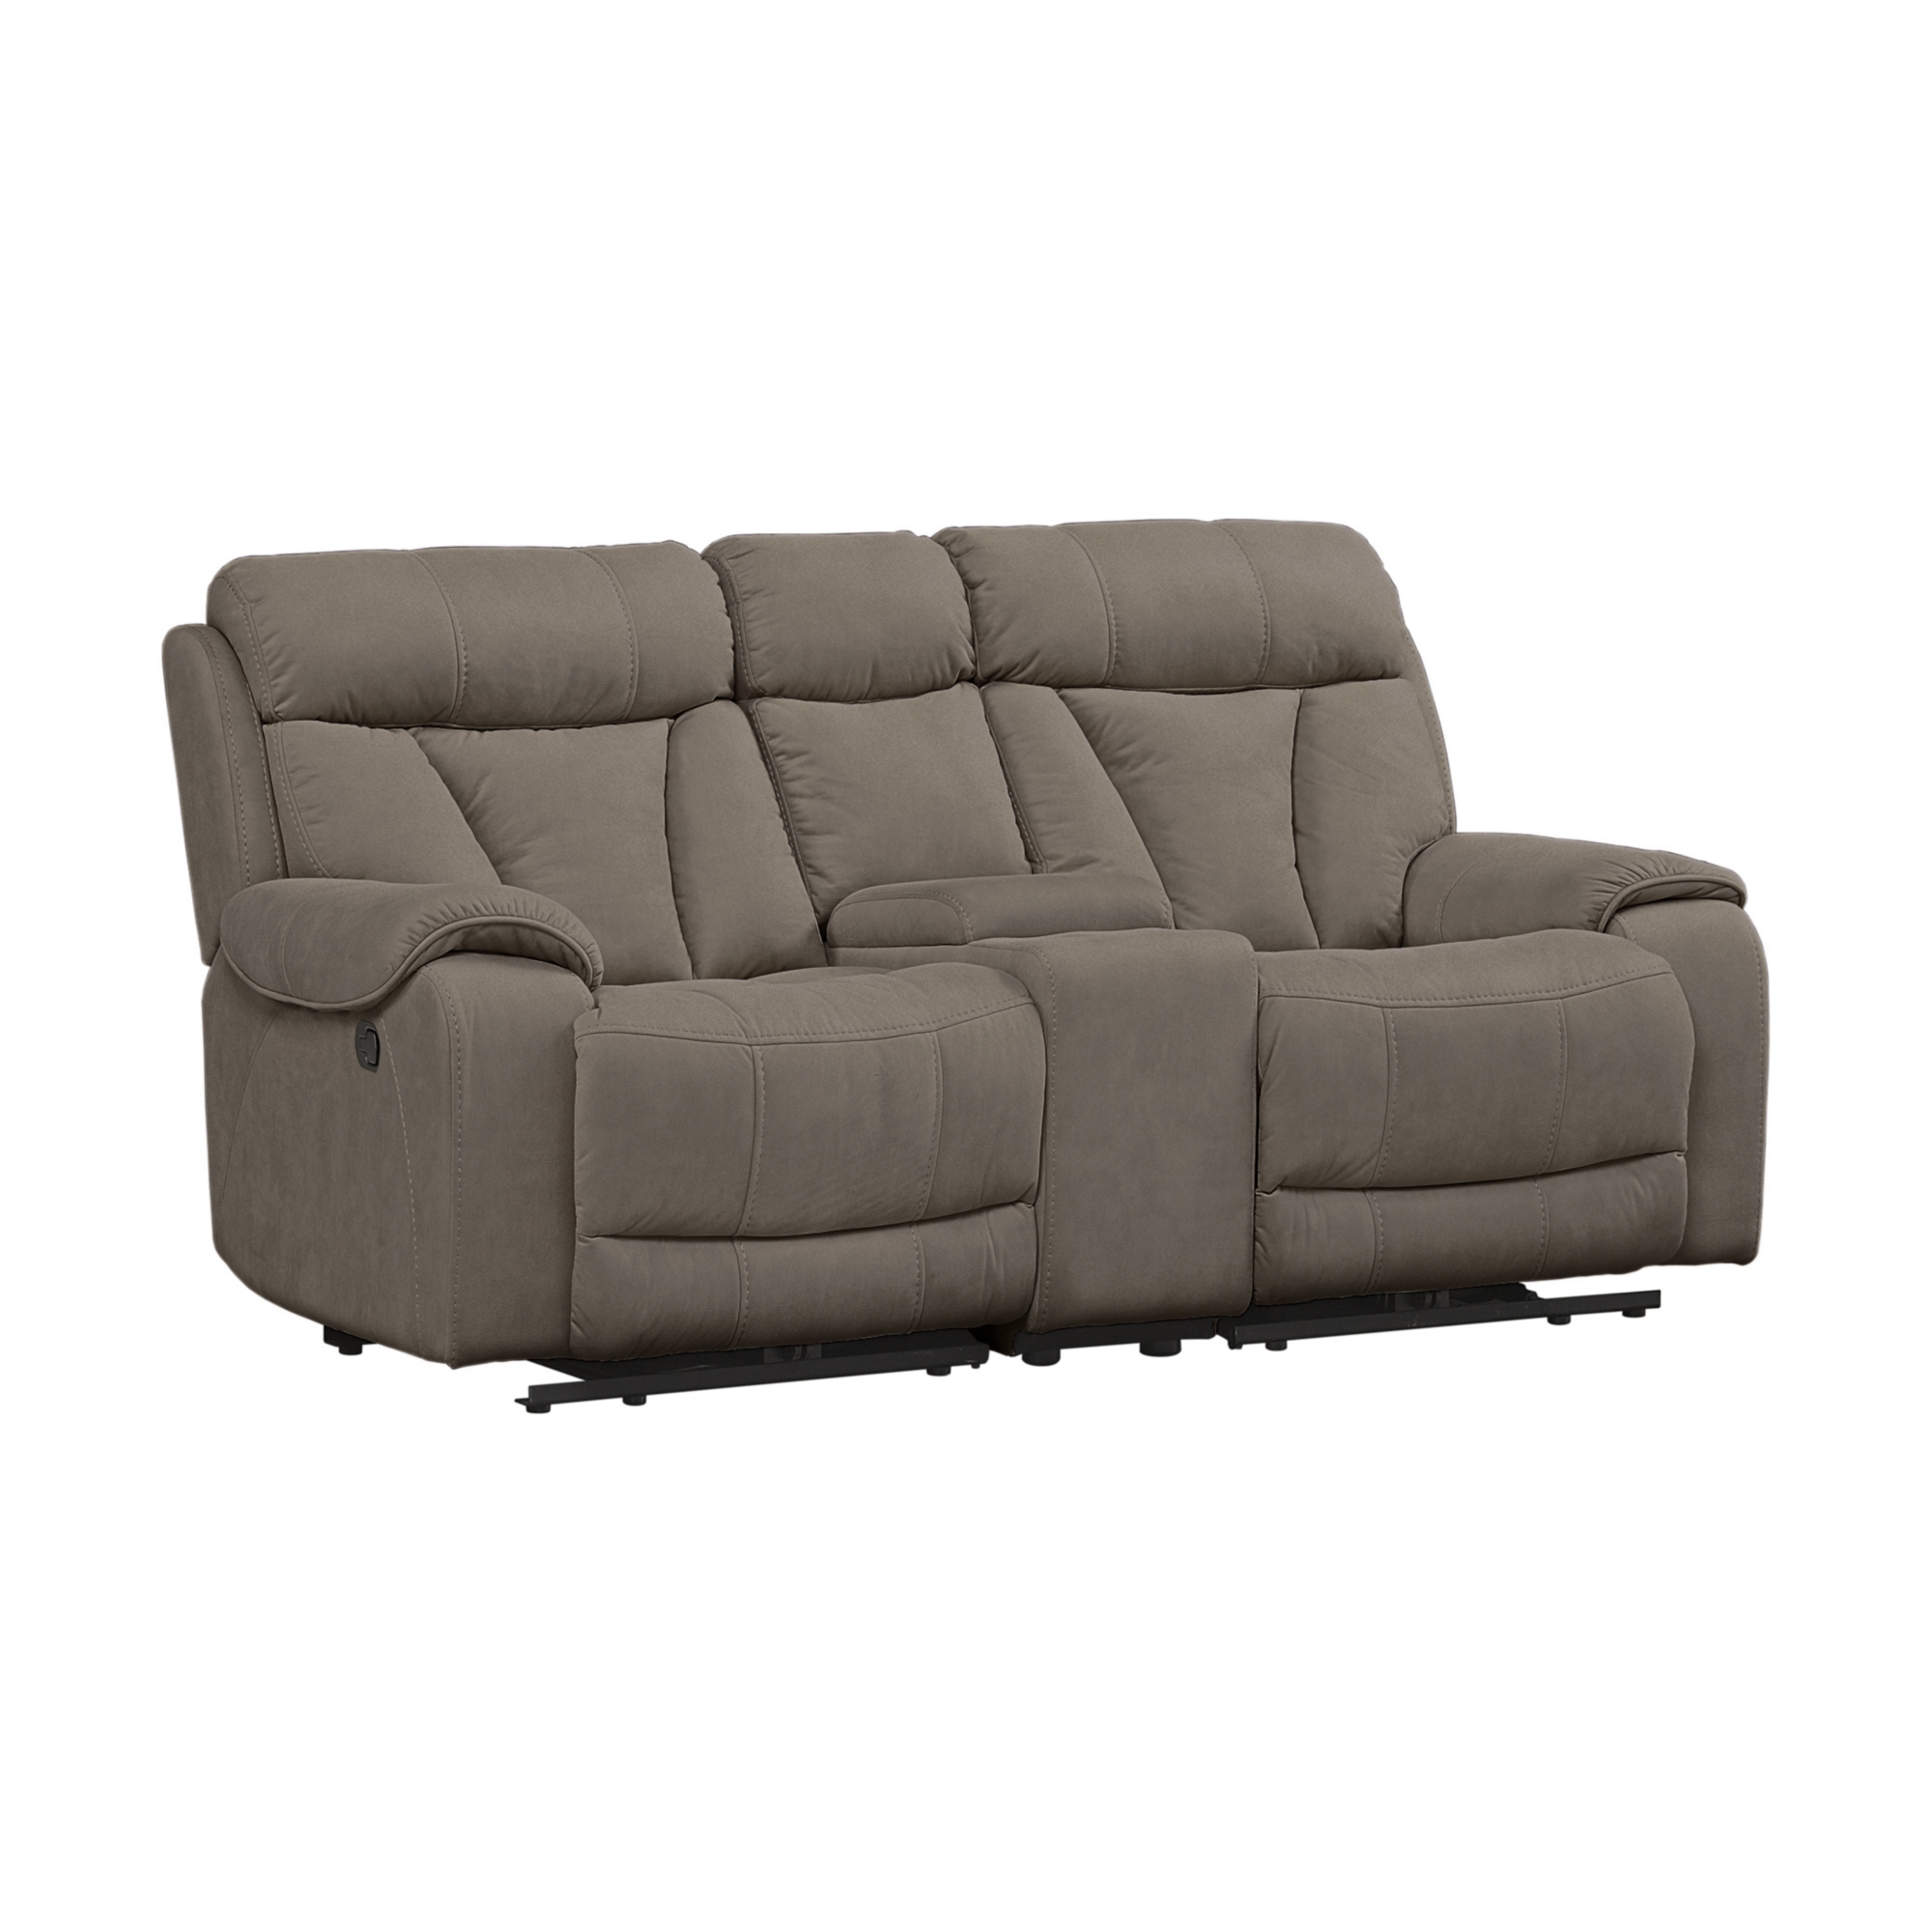 braxton sofa review braxton sofa havertys thesofa